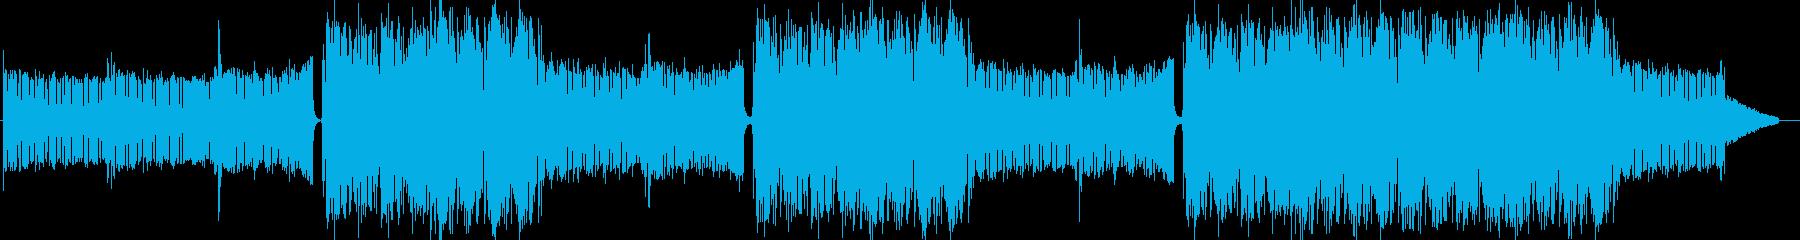 EDMクラブ系ダンスミュージック-05の再生済みの波形